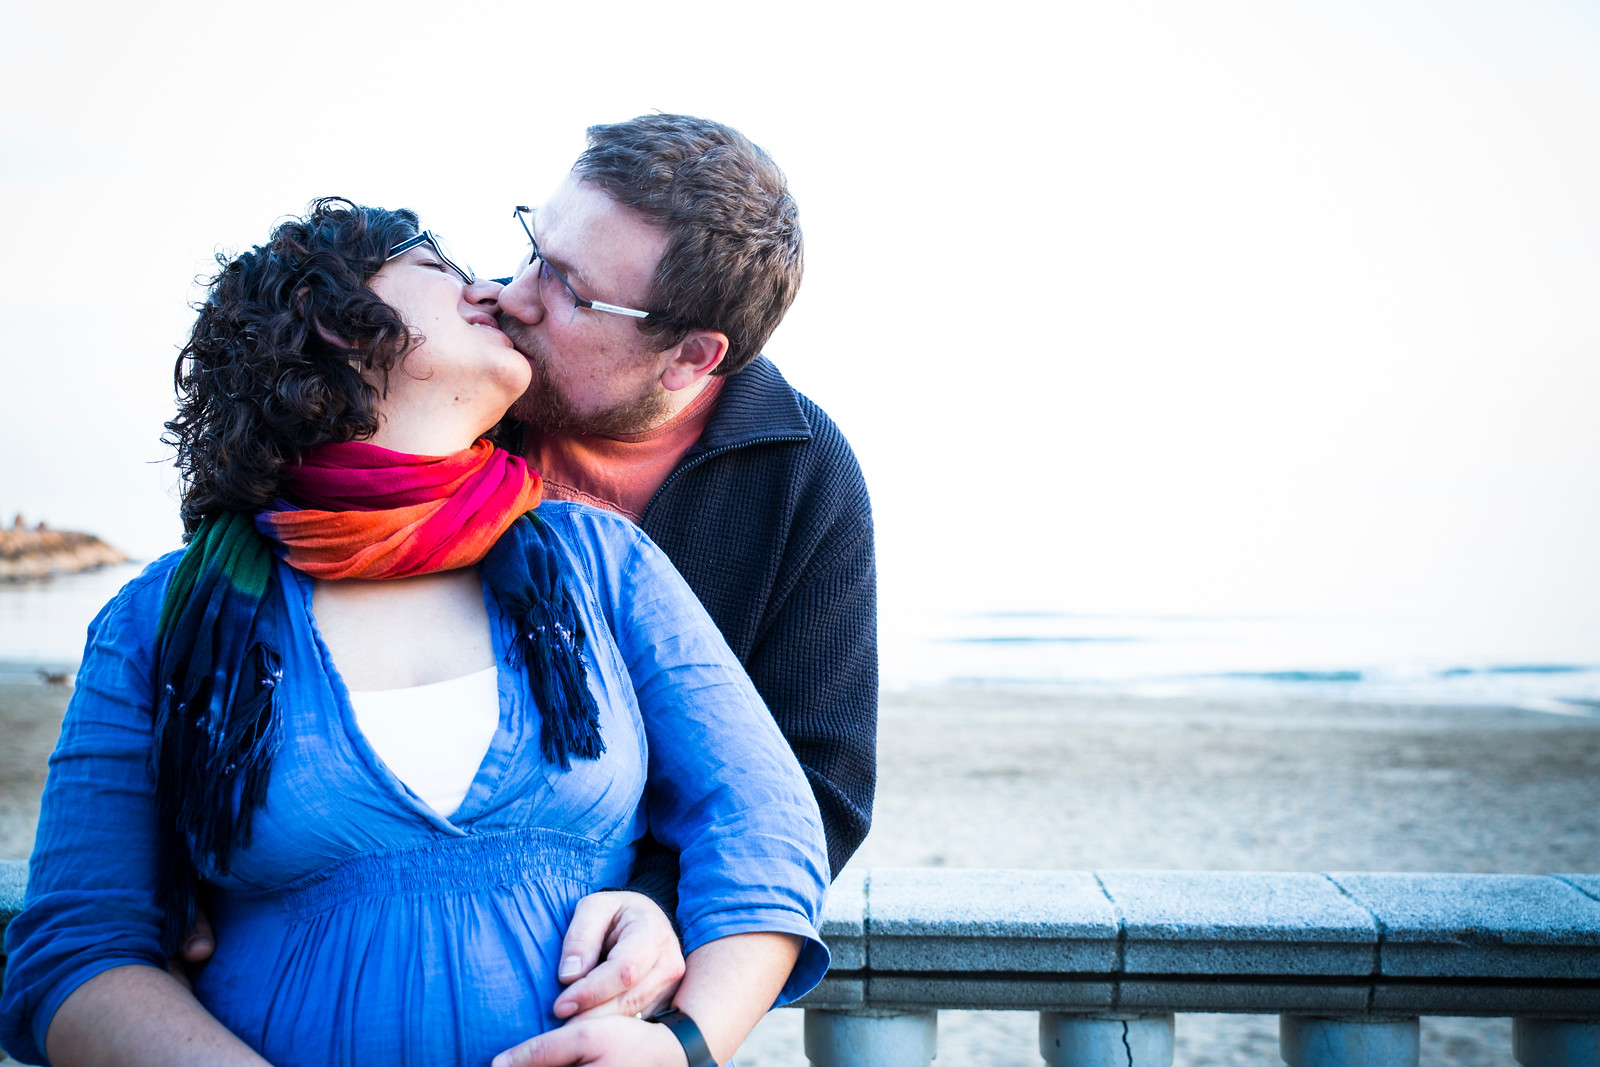 fotografo infantil, fotografo familia, fotografo de embarazo,reportaje de seguimiento de embarazo, elena rubio fotografa mollet 24